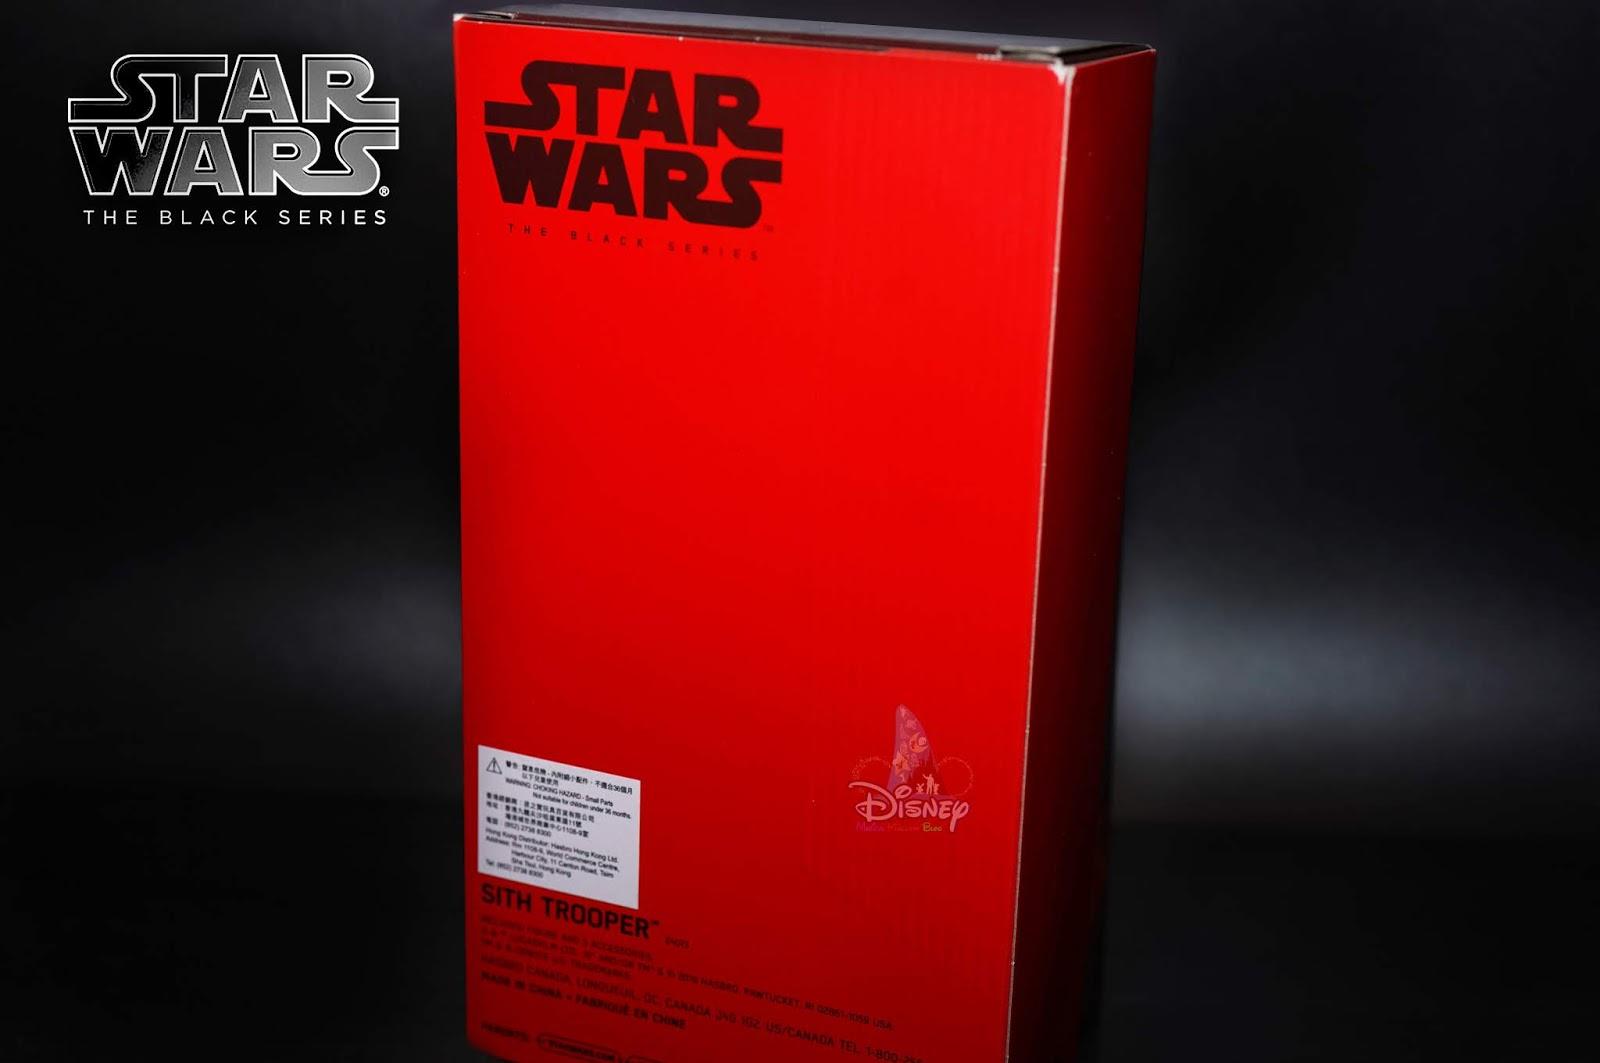 Star Wars The Black Series Sith Trooper